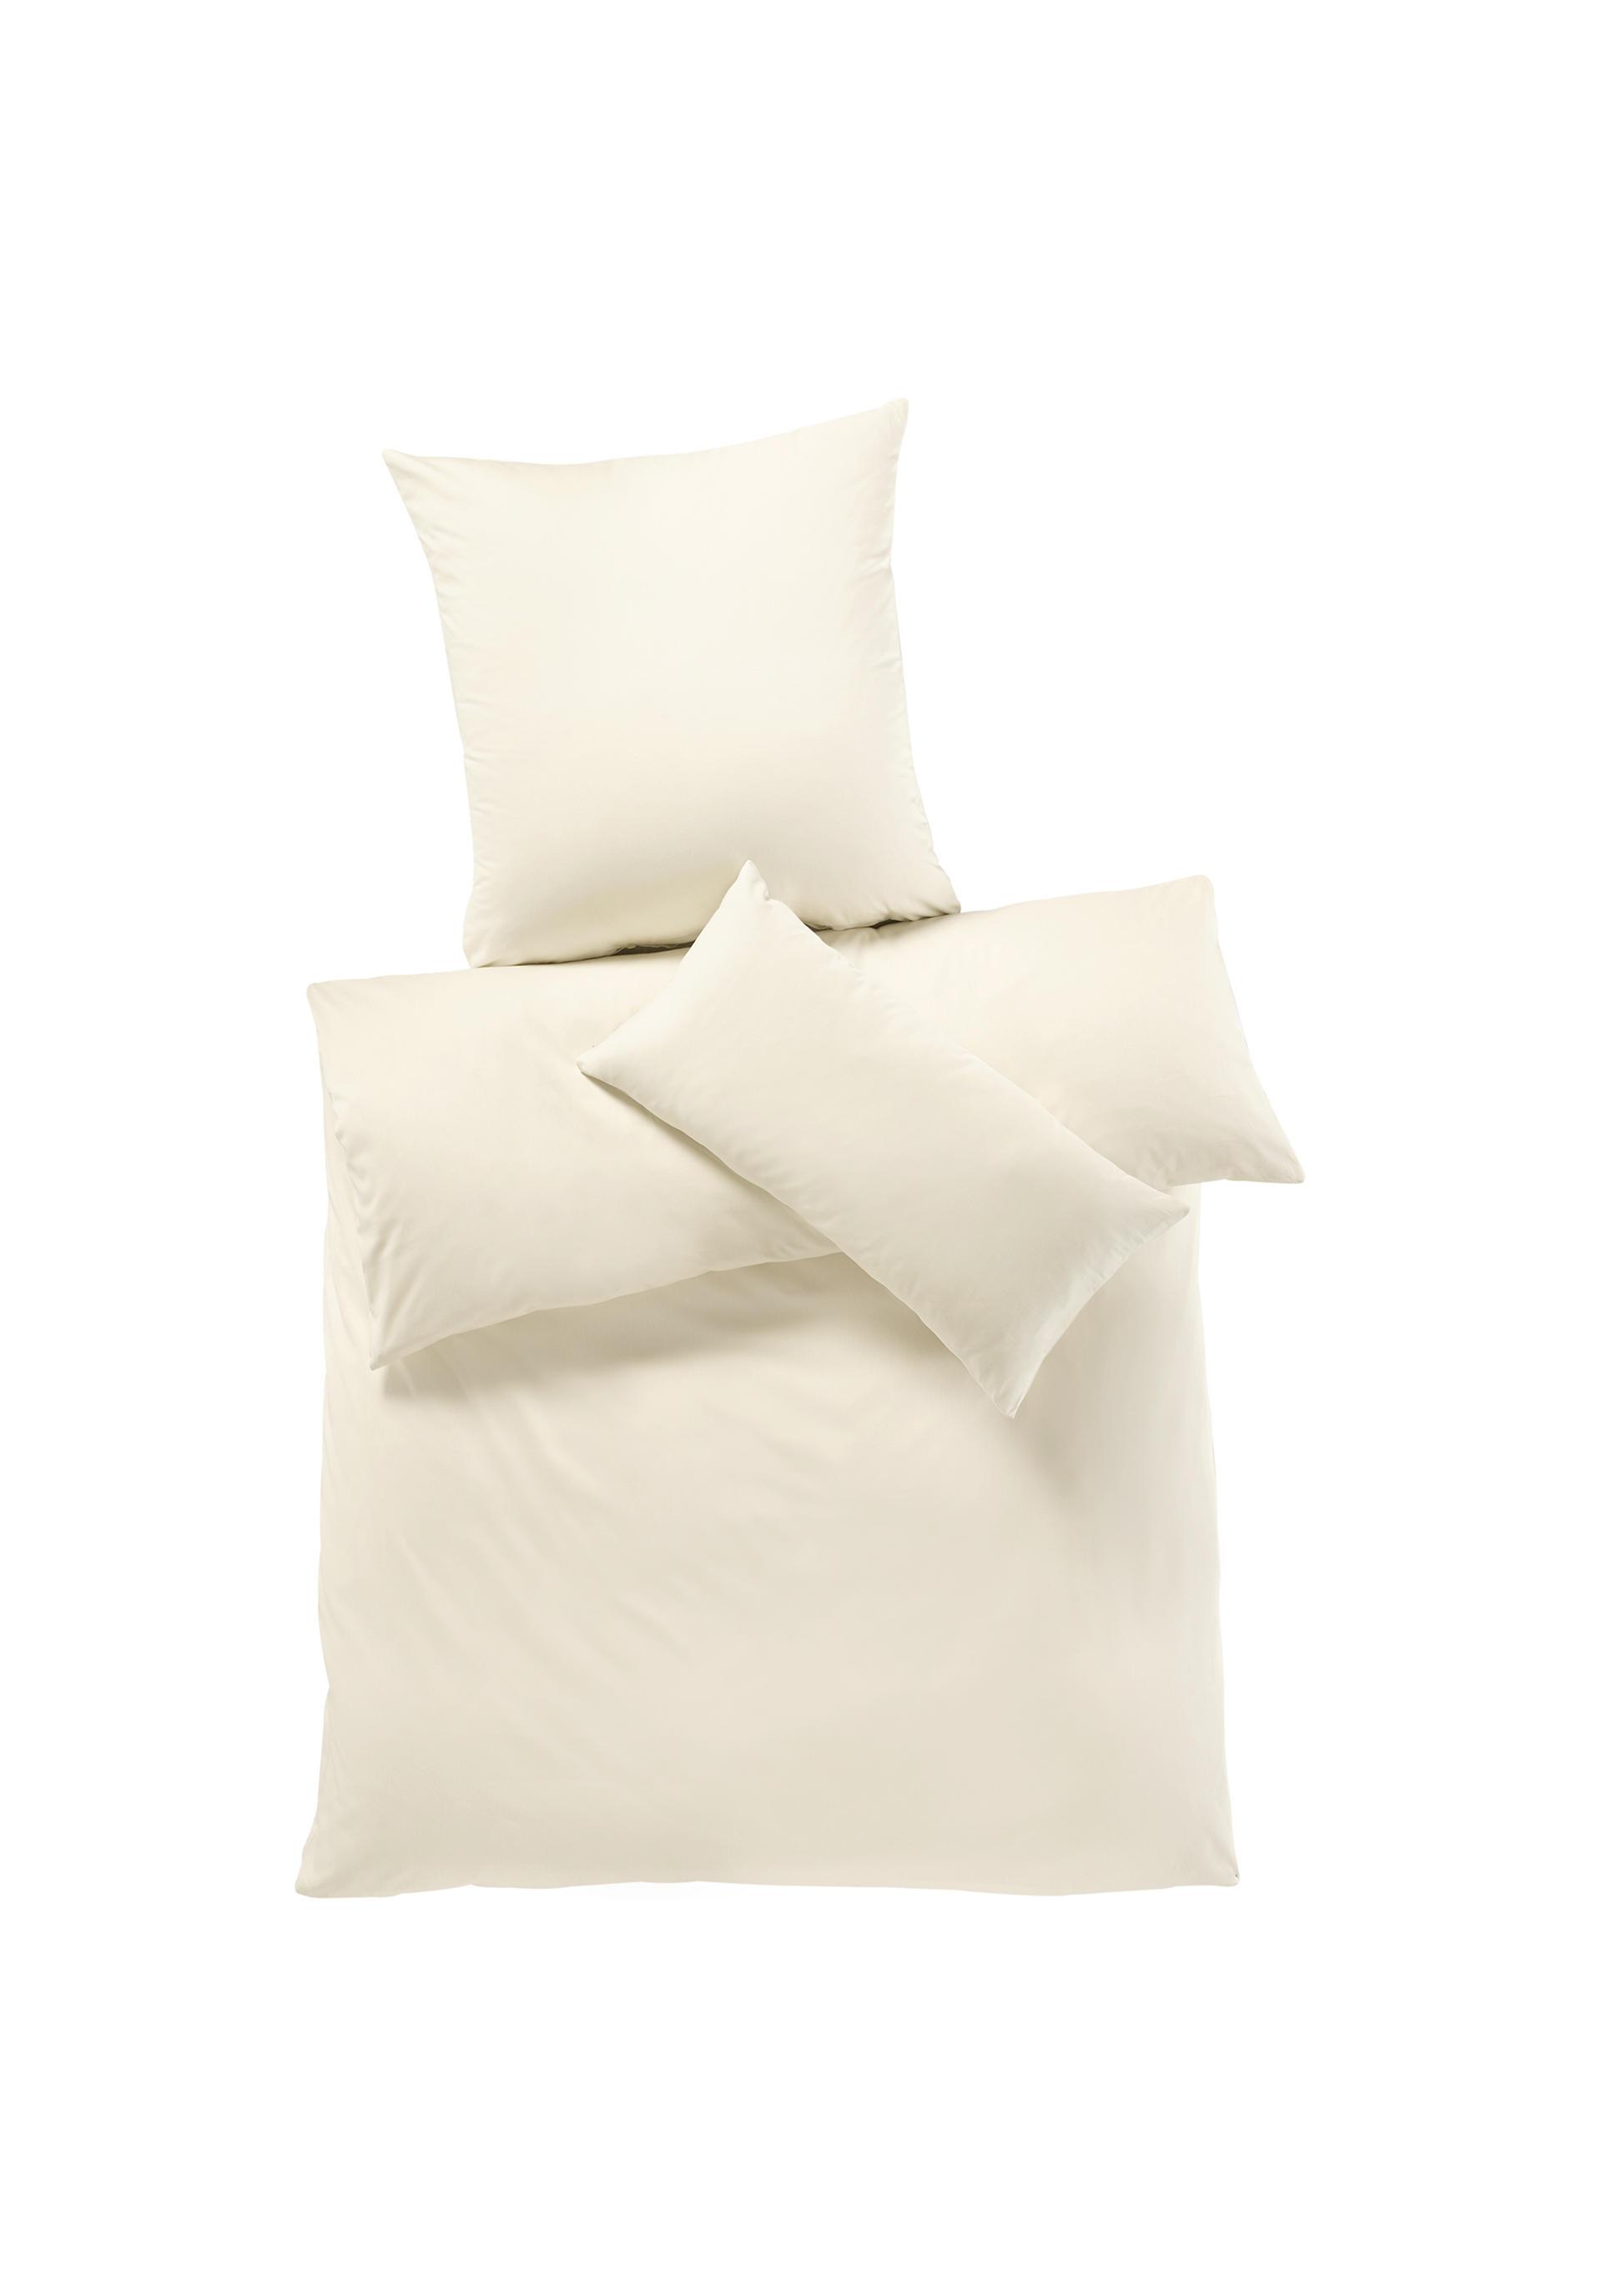 satin bettwsche stunning with satin bettwsche awesome ibena makosatin bettwsche zeitgeist. Black Bedroom Furniture Sets. Home Design Ideas